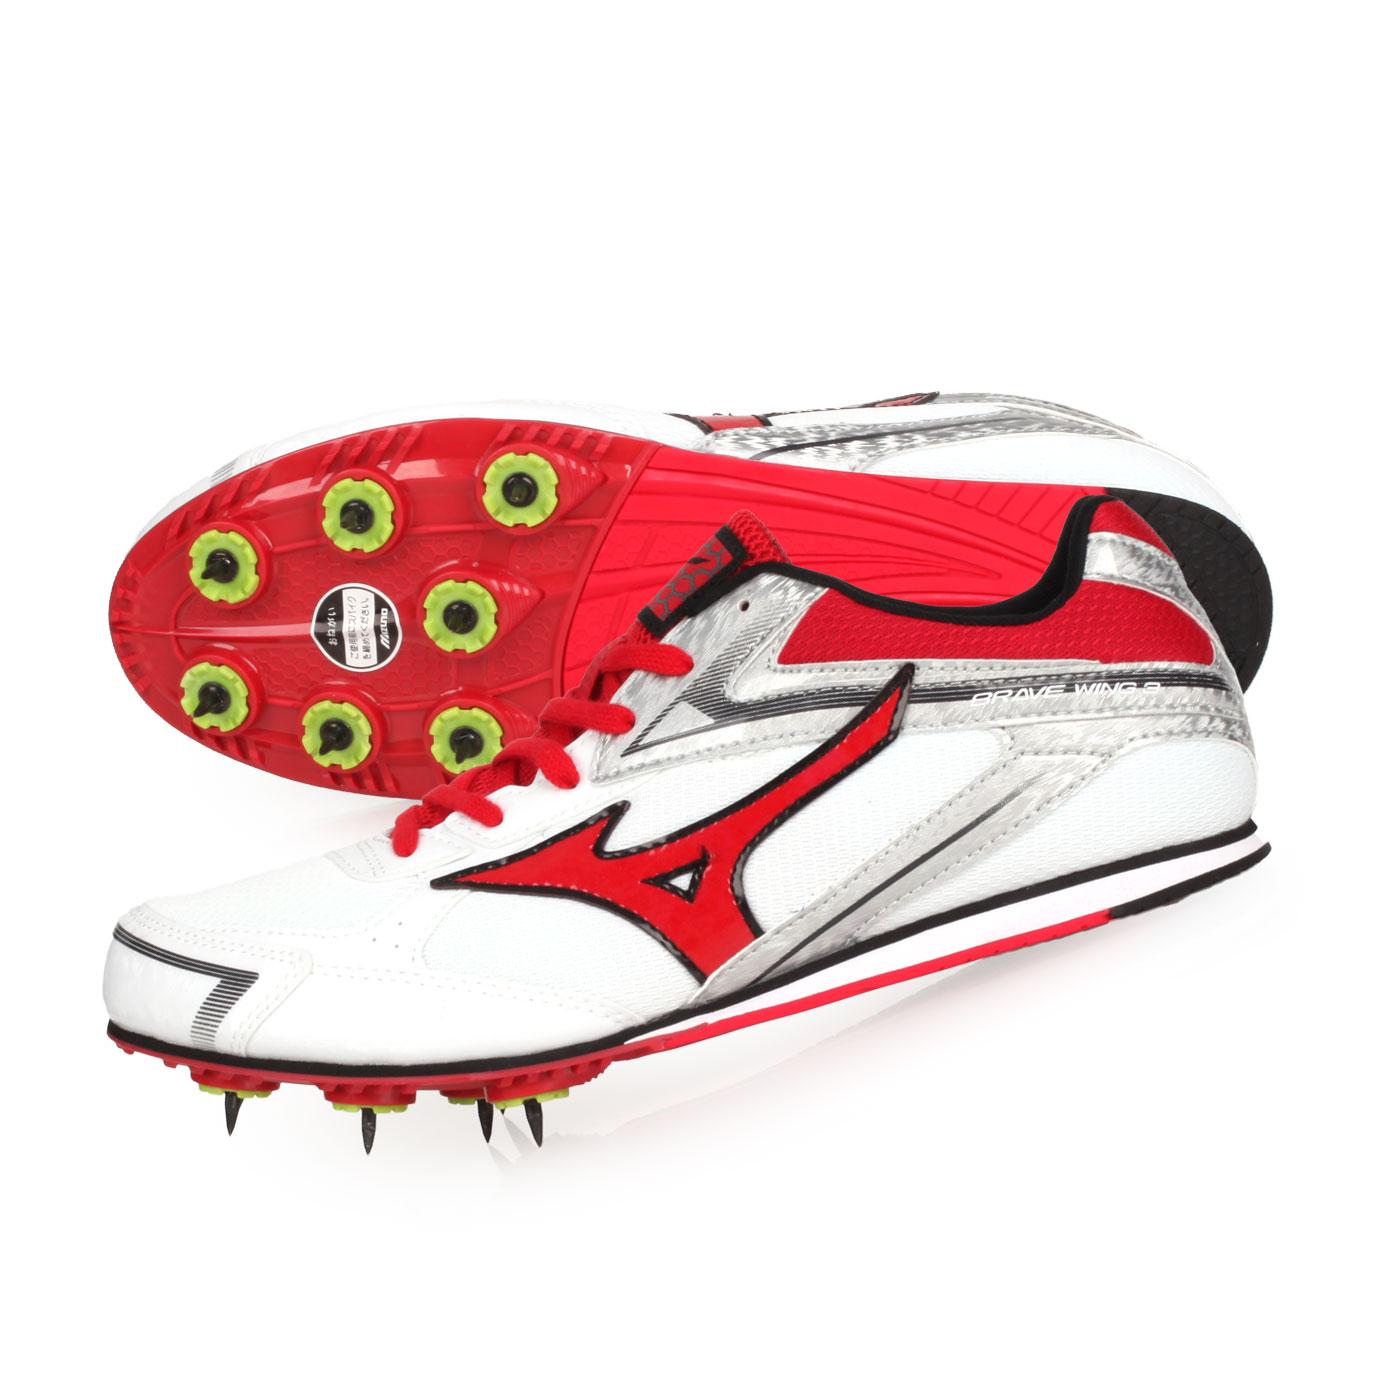 MIZUNO 田徑釘鞋(中長距離)  @BRAVE WING 3@U1GA183005 - 白紅